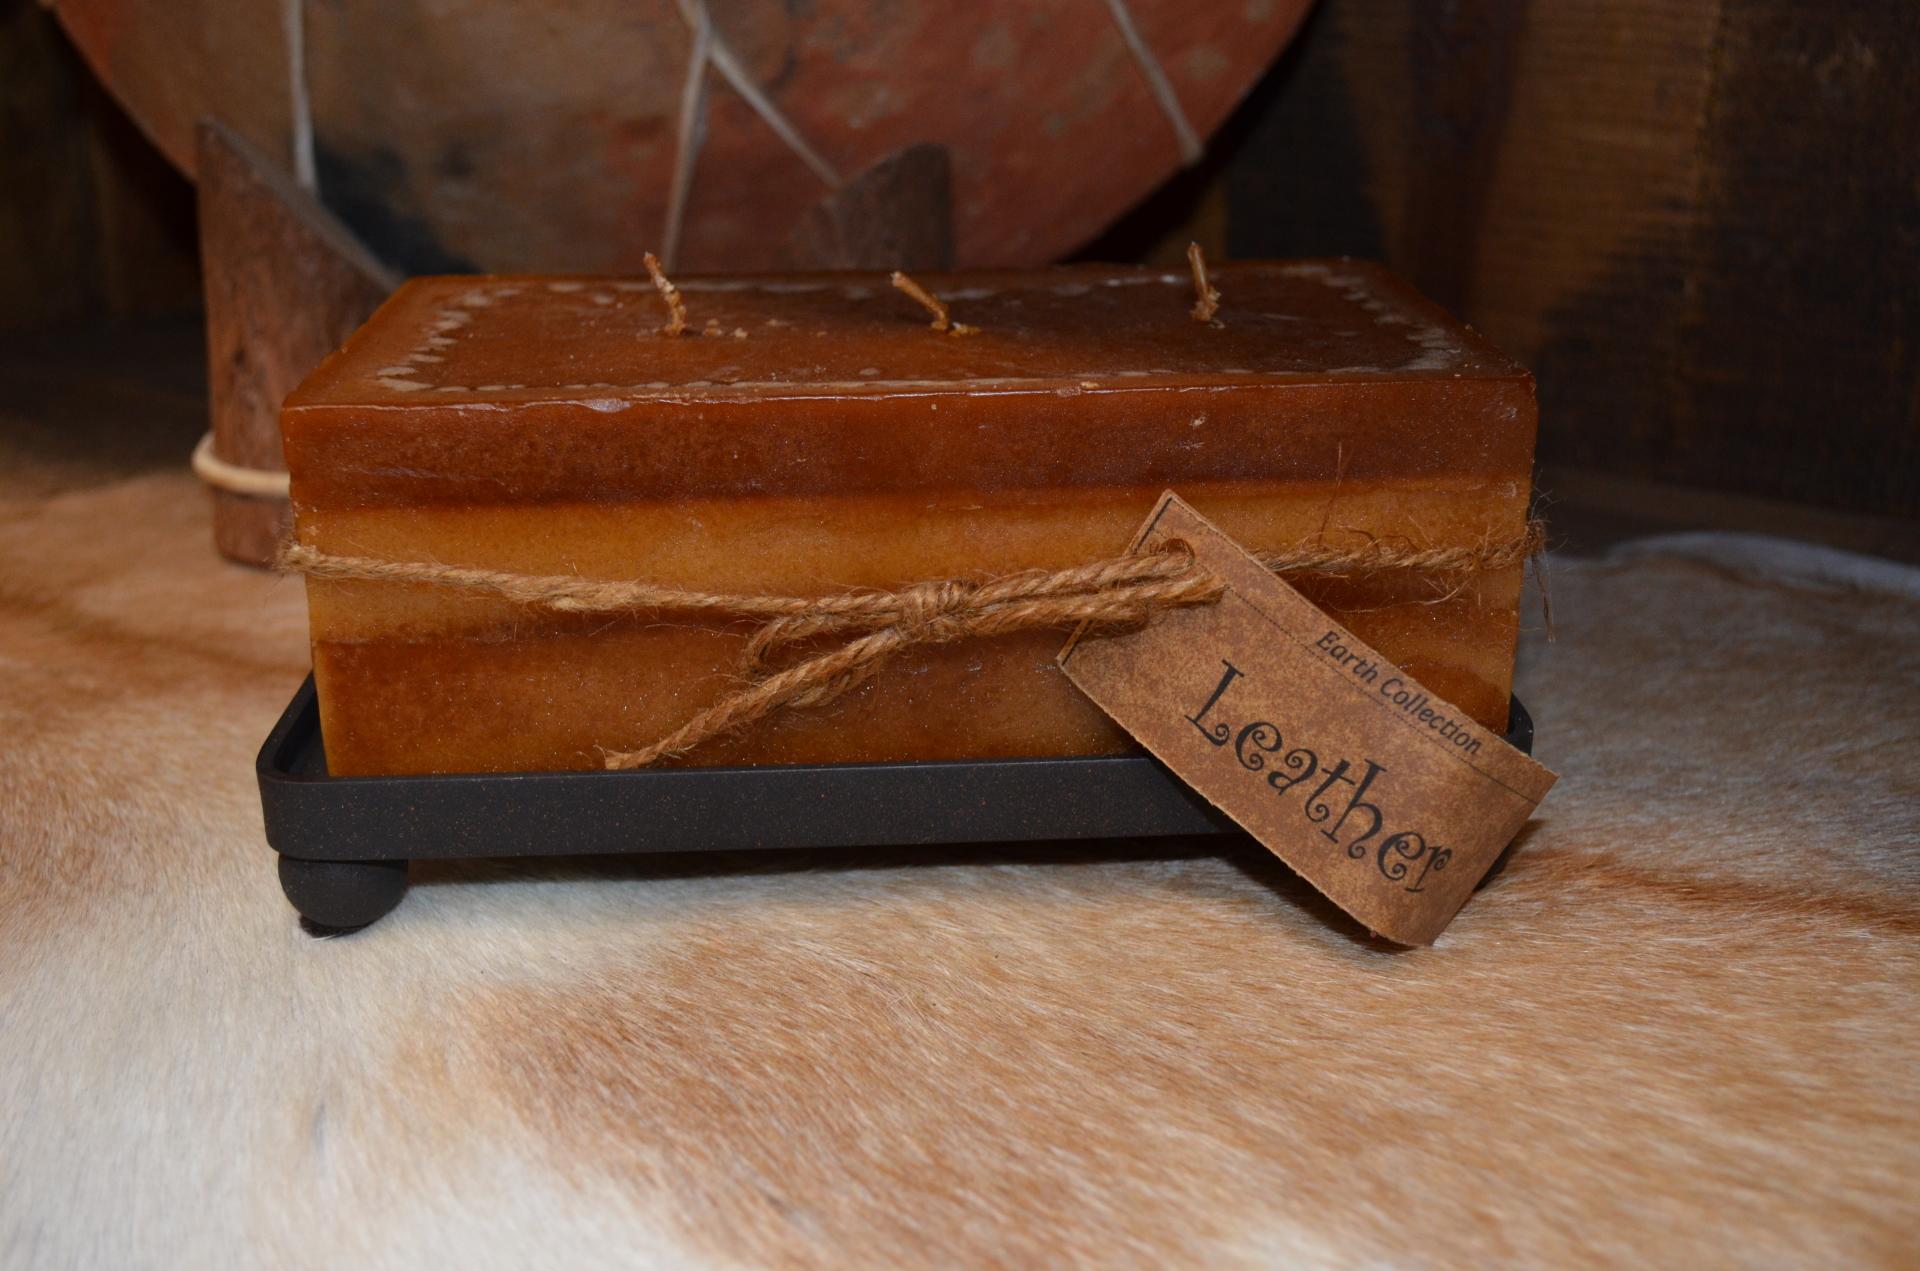 Small Brick Leather $20